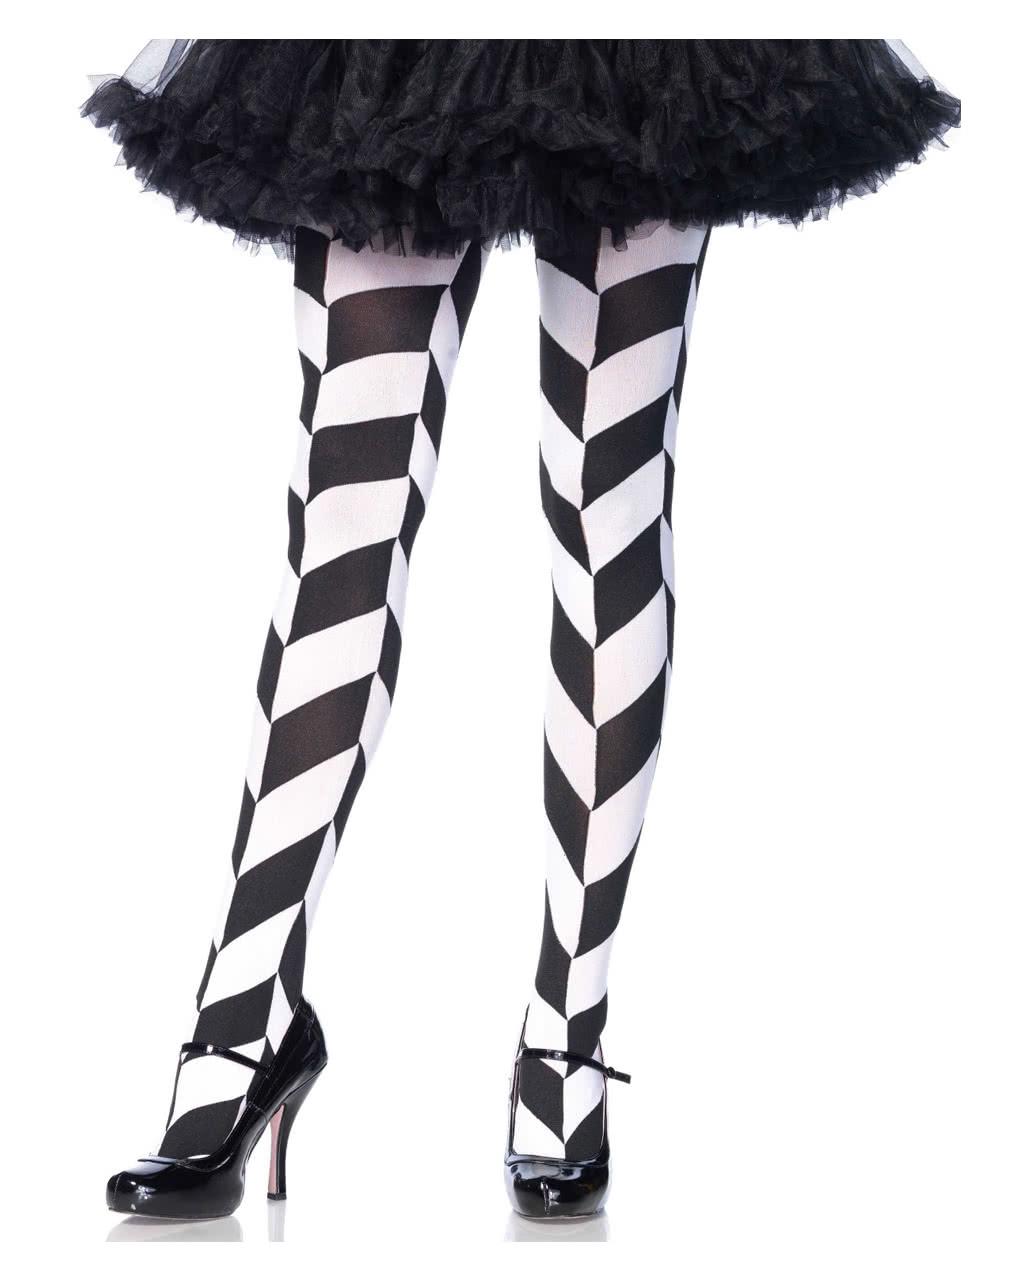 cd2cc77bba22d Pantyhose rhombus optics ◇ ◇ Harlequin nylons | horror-shop.com